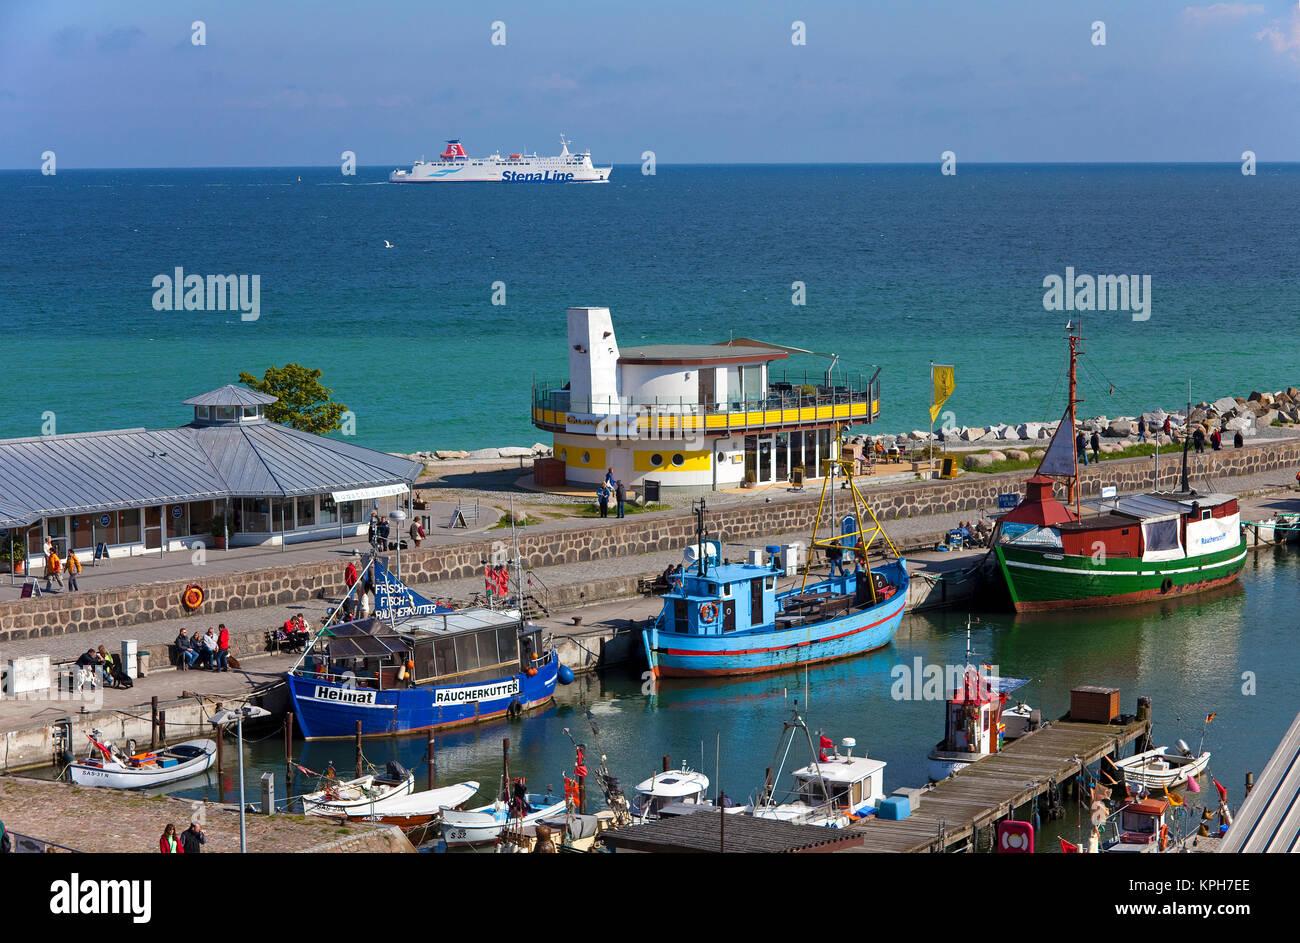 Harbour of Sassnitz, ferry on sea, Ruegen island, Mecklenburg-Western Pomerania, Baltic Sea, Germany, Europe Stock Photo